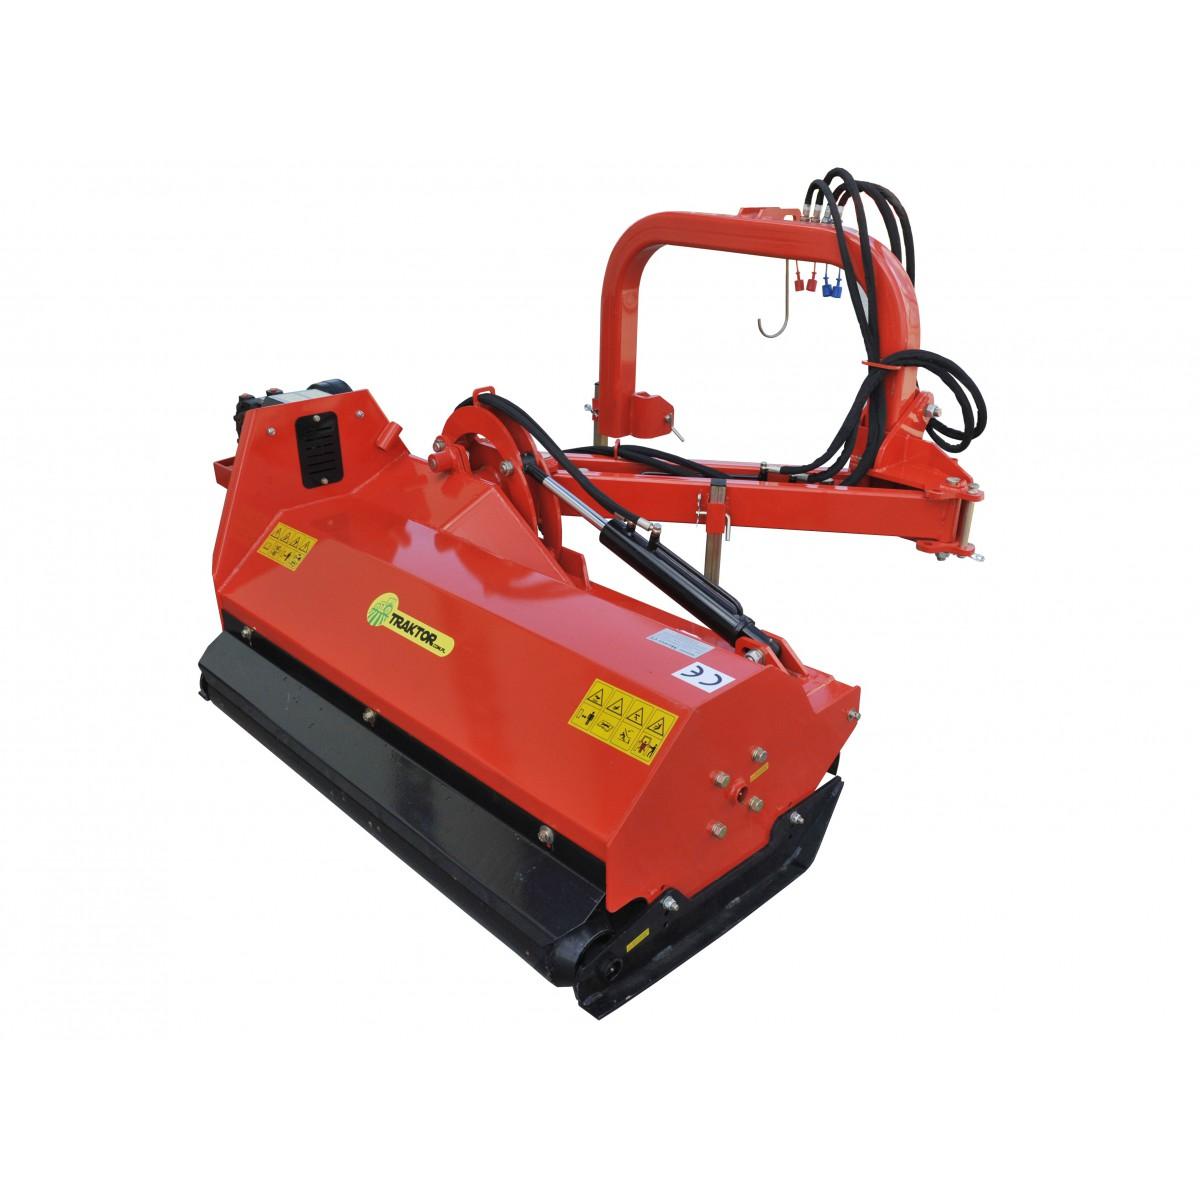 AGH 160 REAR-SIDE Flail Mower